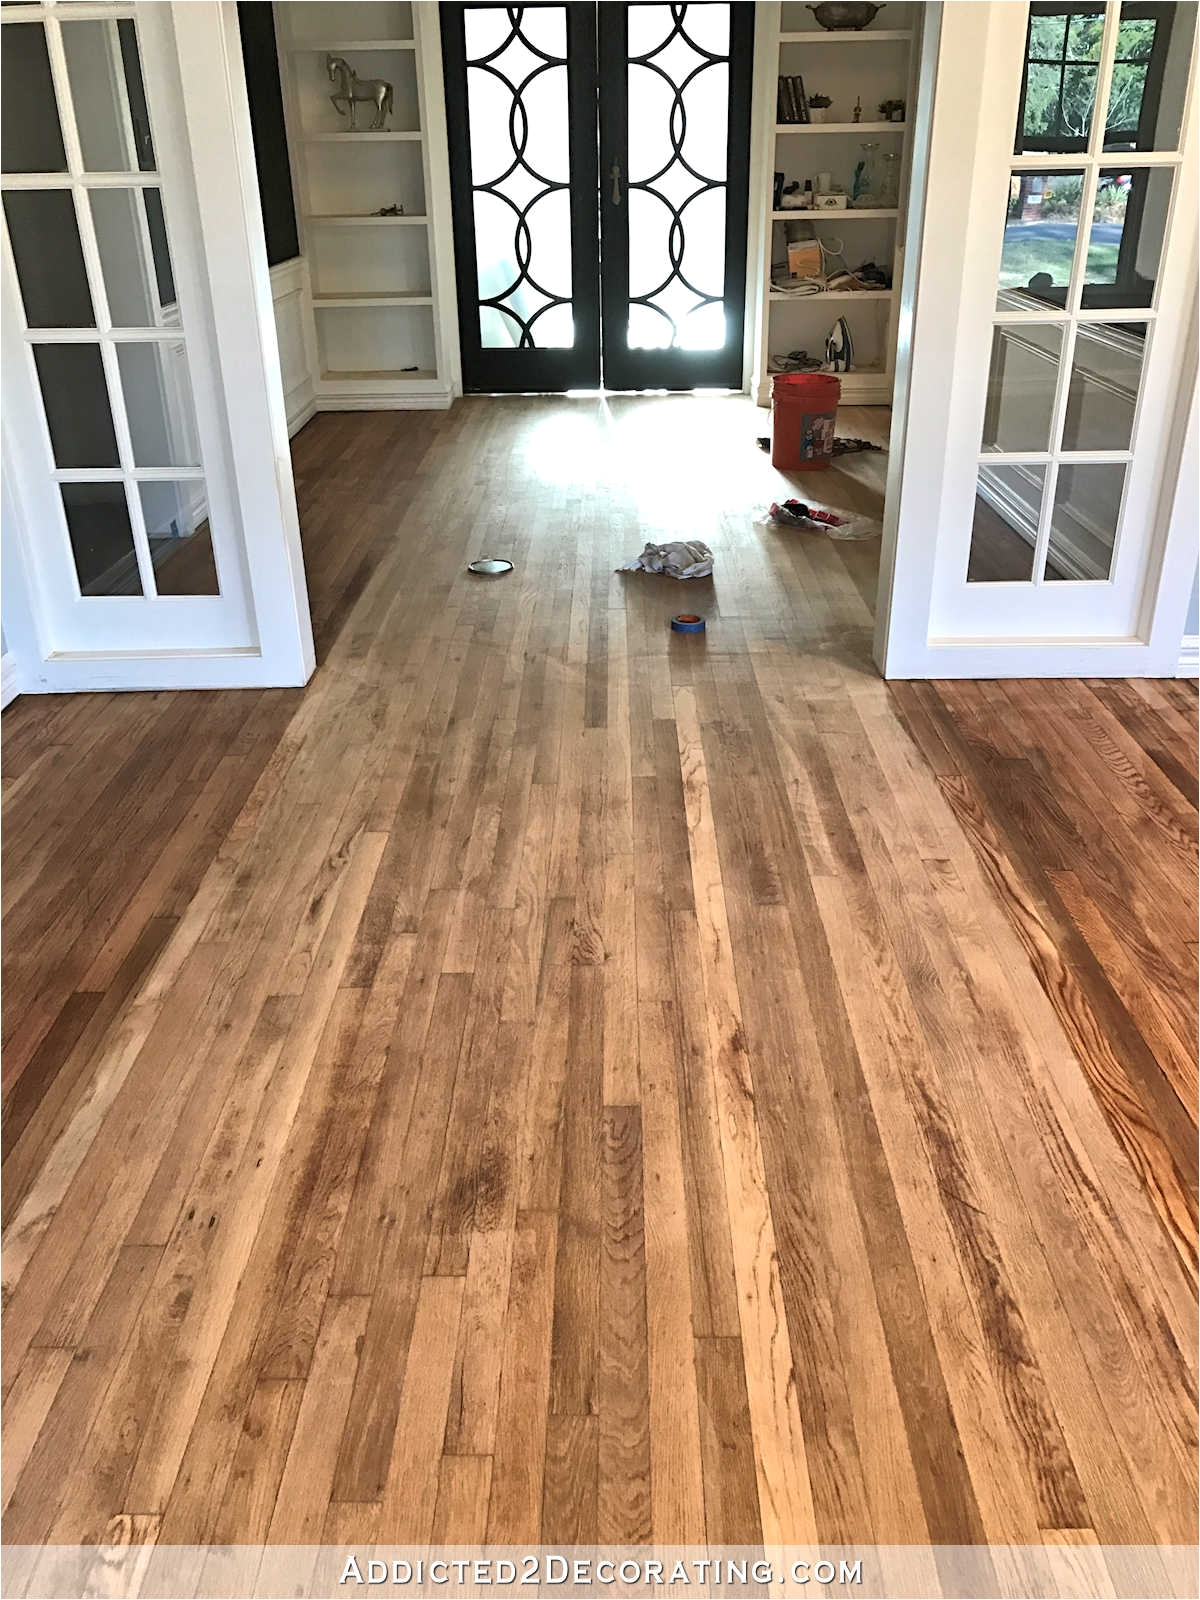 staining red oak hardwood floors 5 music room wood conditioner